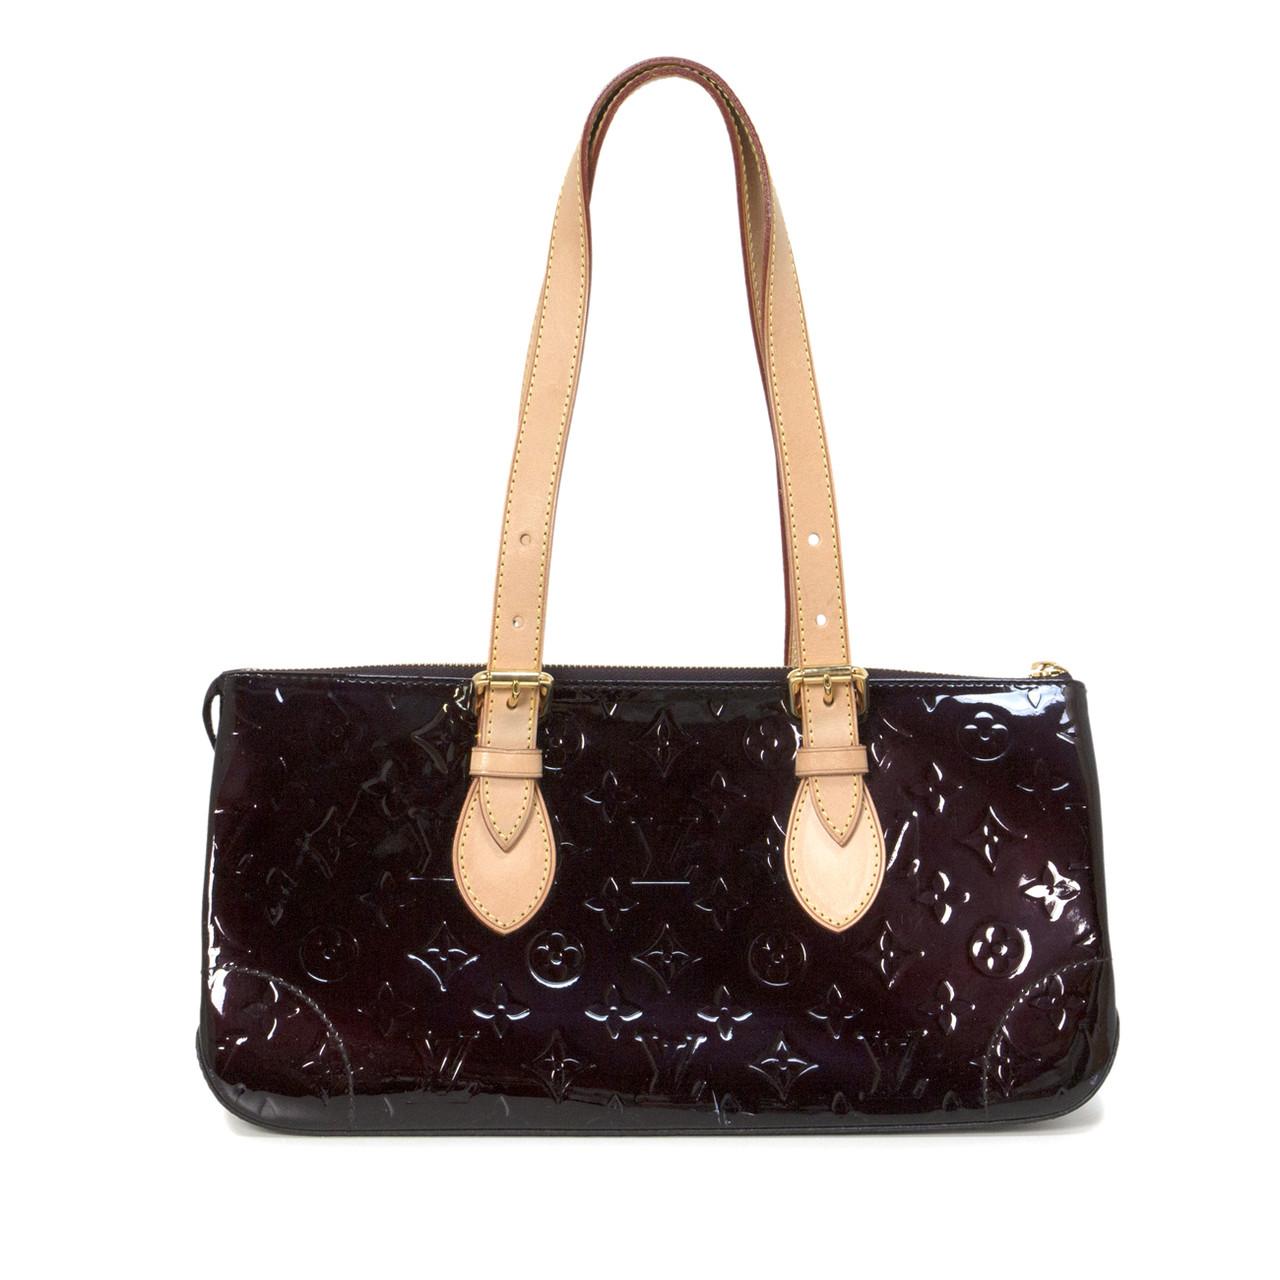 Louis Vuitton Amarante Vernis Rosewood Avenue 74f4ffa57a2aa